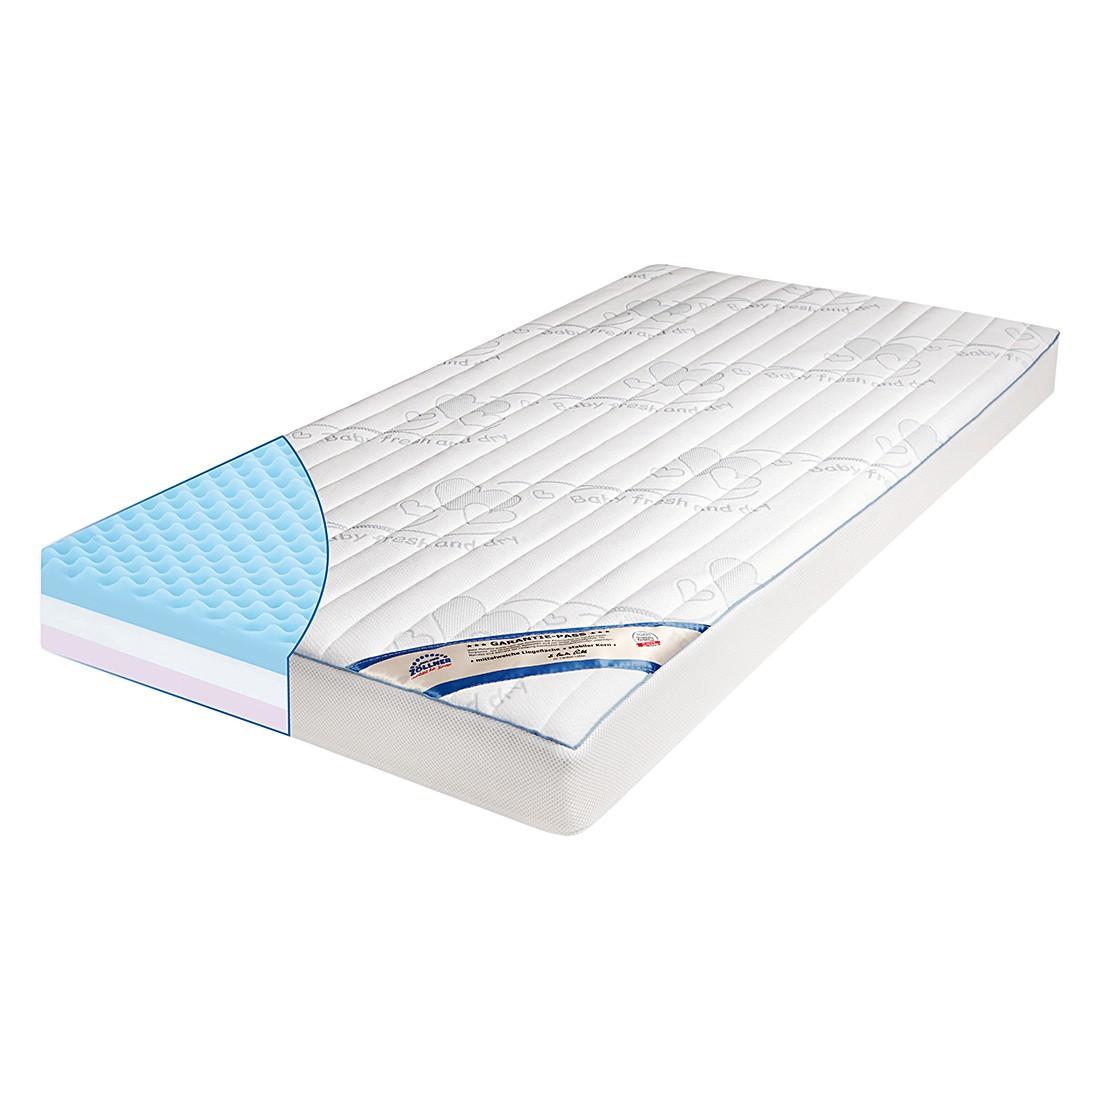 Materasso in schiuma a freddo per bimbi Dr. Lübbe Air Plus Dryfeel - Superficie letto: 70 x 140 cm, Julius Zöllner